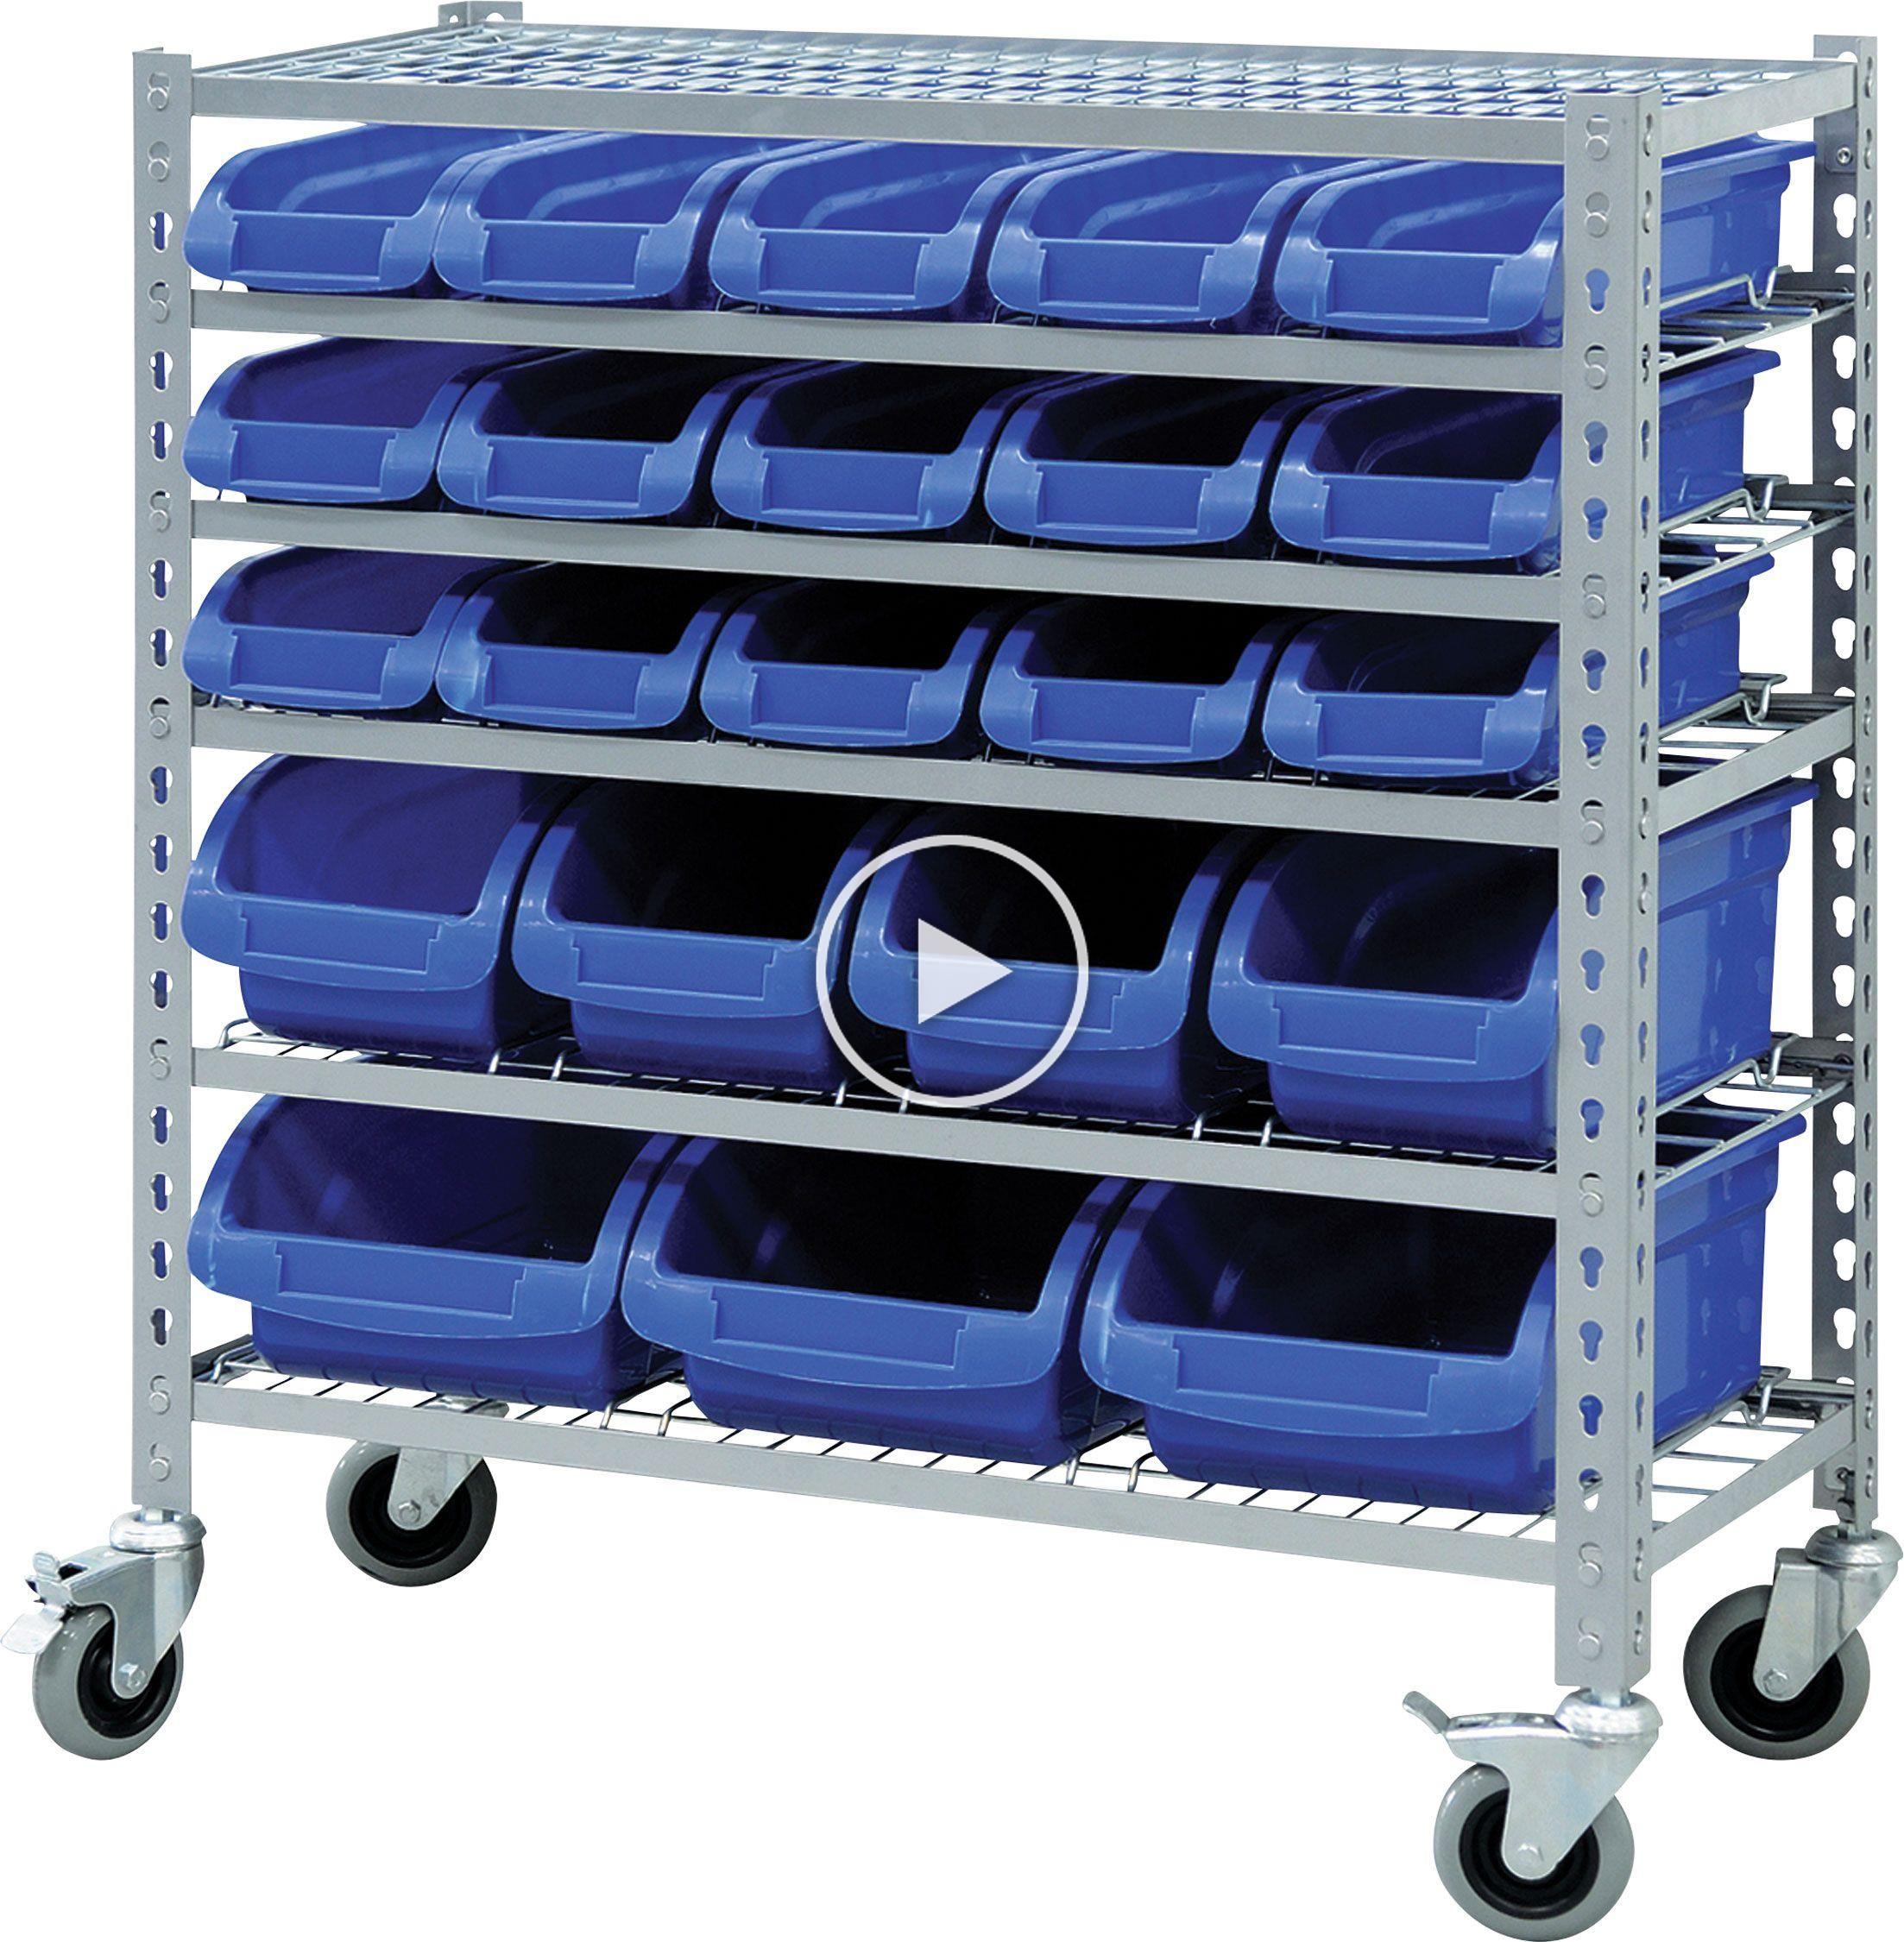 22 Bin Storage Rack Princess Auto In 2020 With Images Storage Bin Racks Industrial Shelving Units Cheap Storage